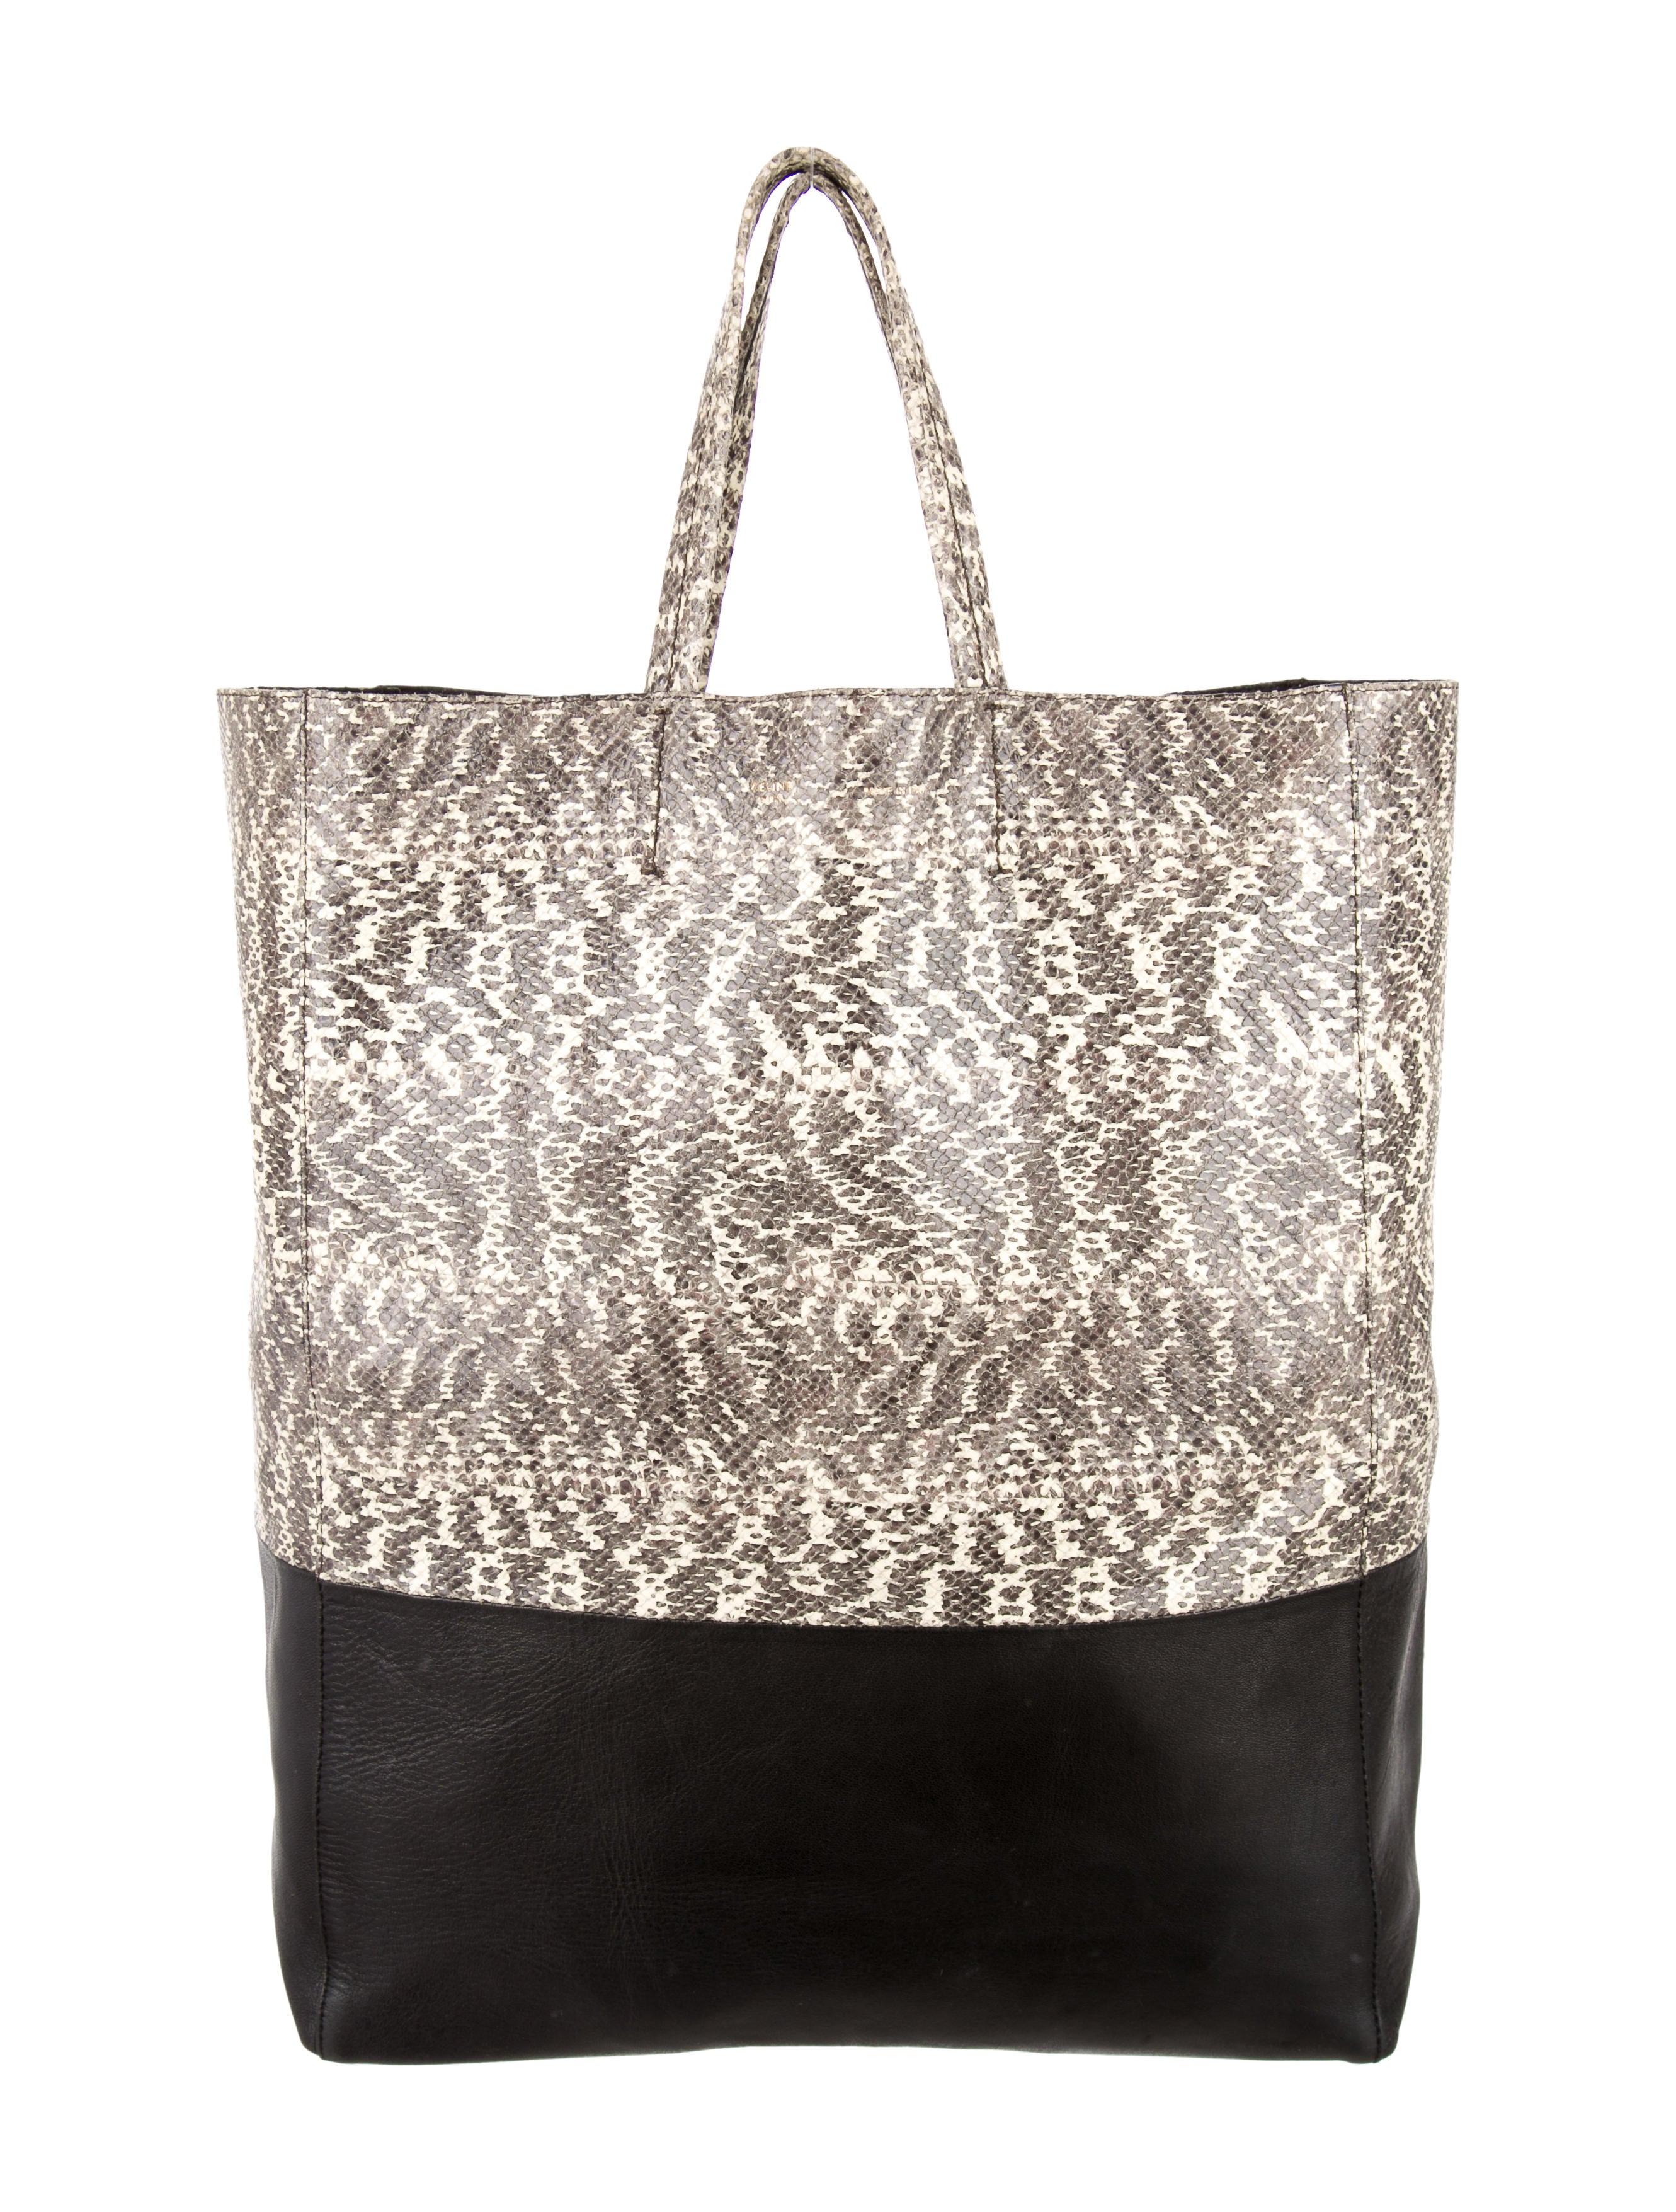 celine mini luggage tote bag price - celine python vertical cabas tote, celine shopper tote bag